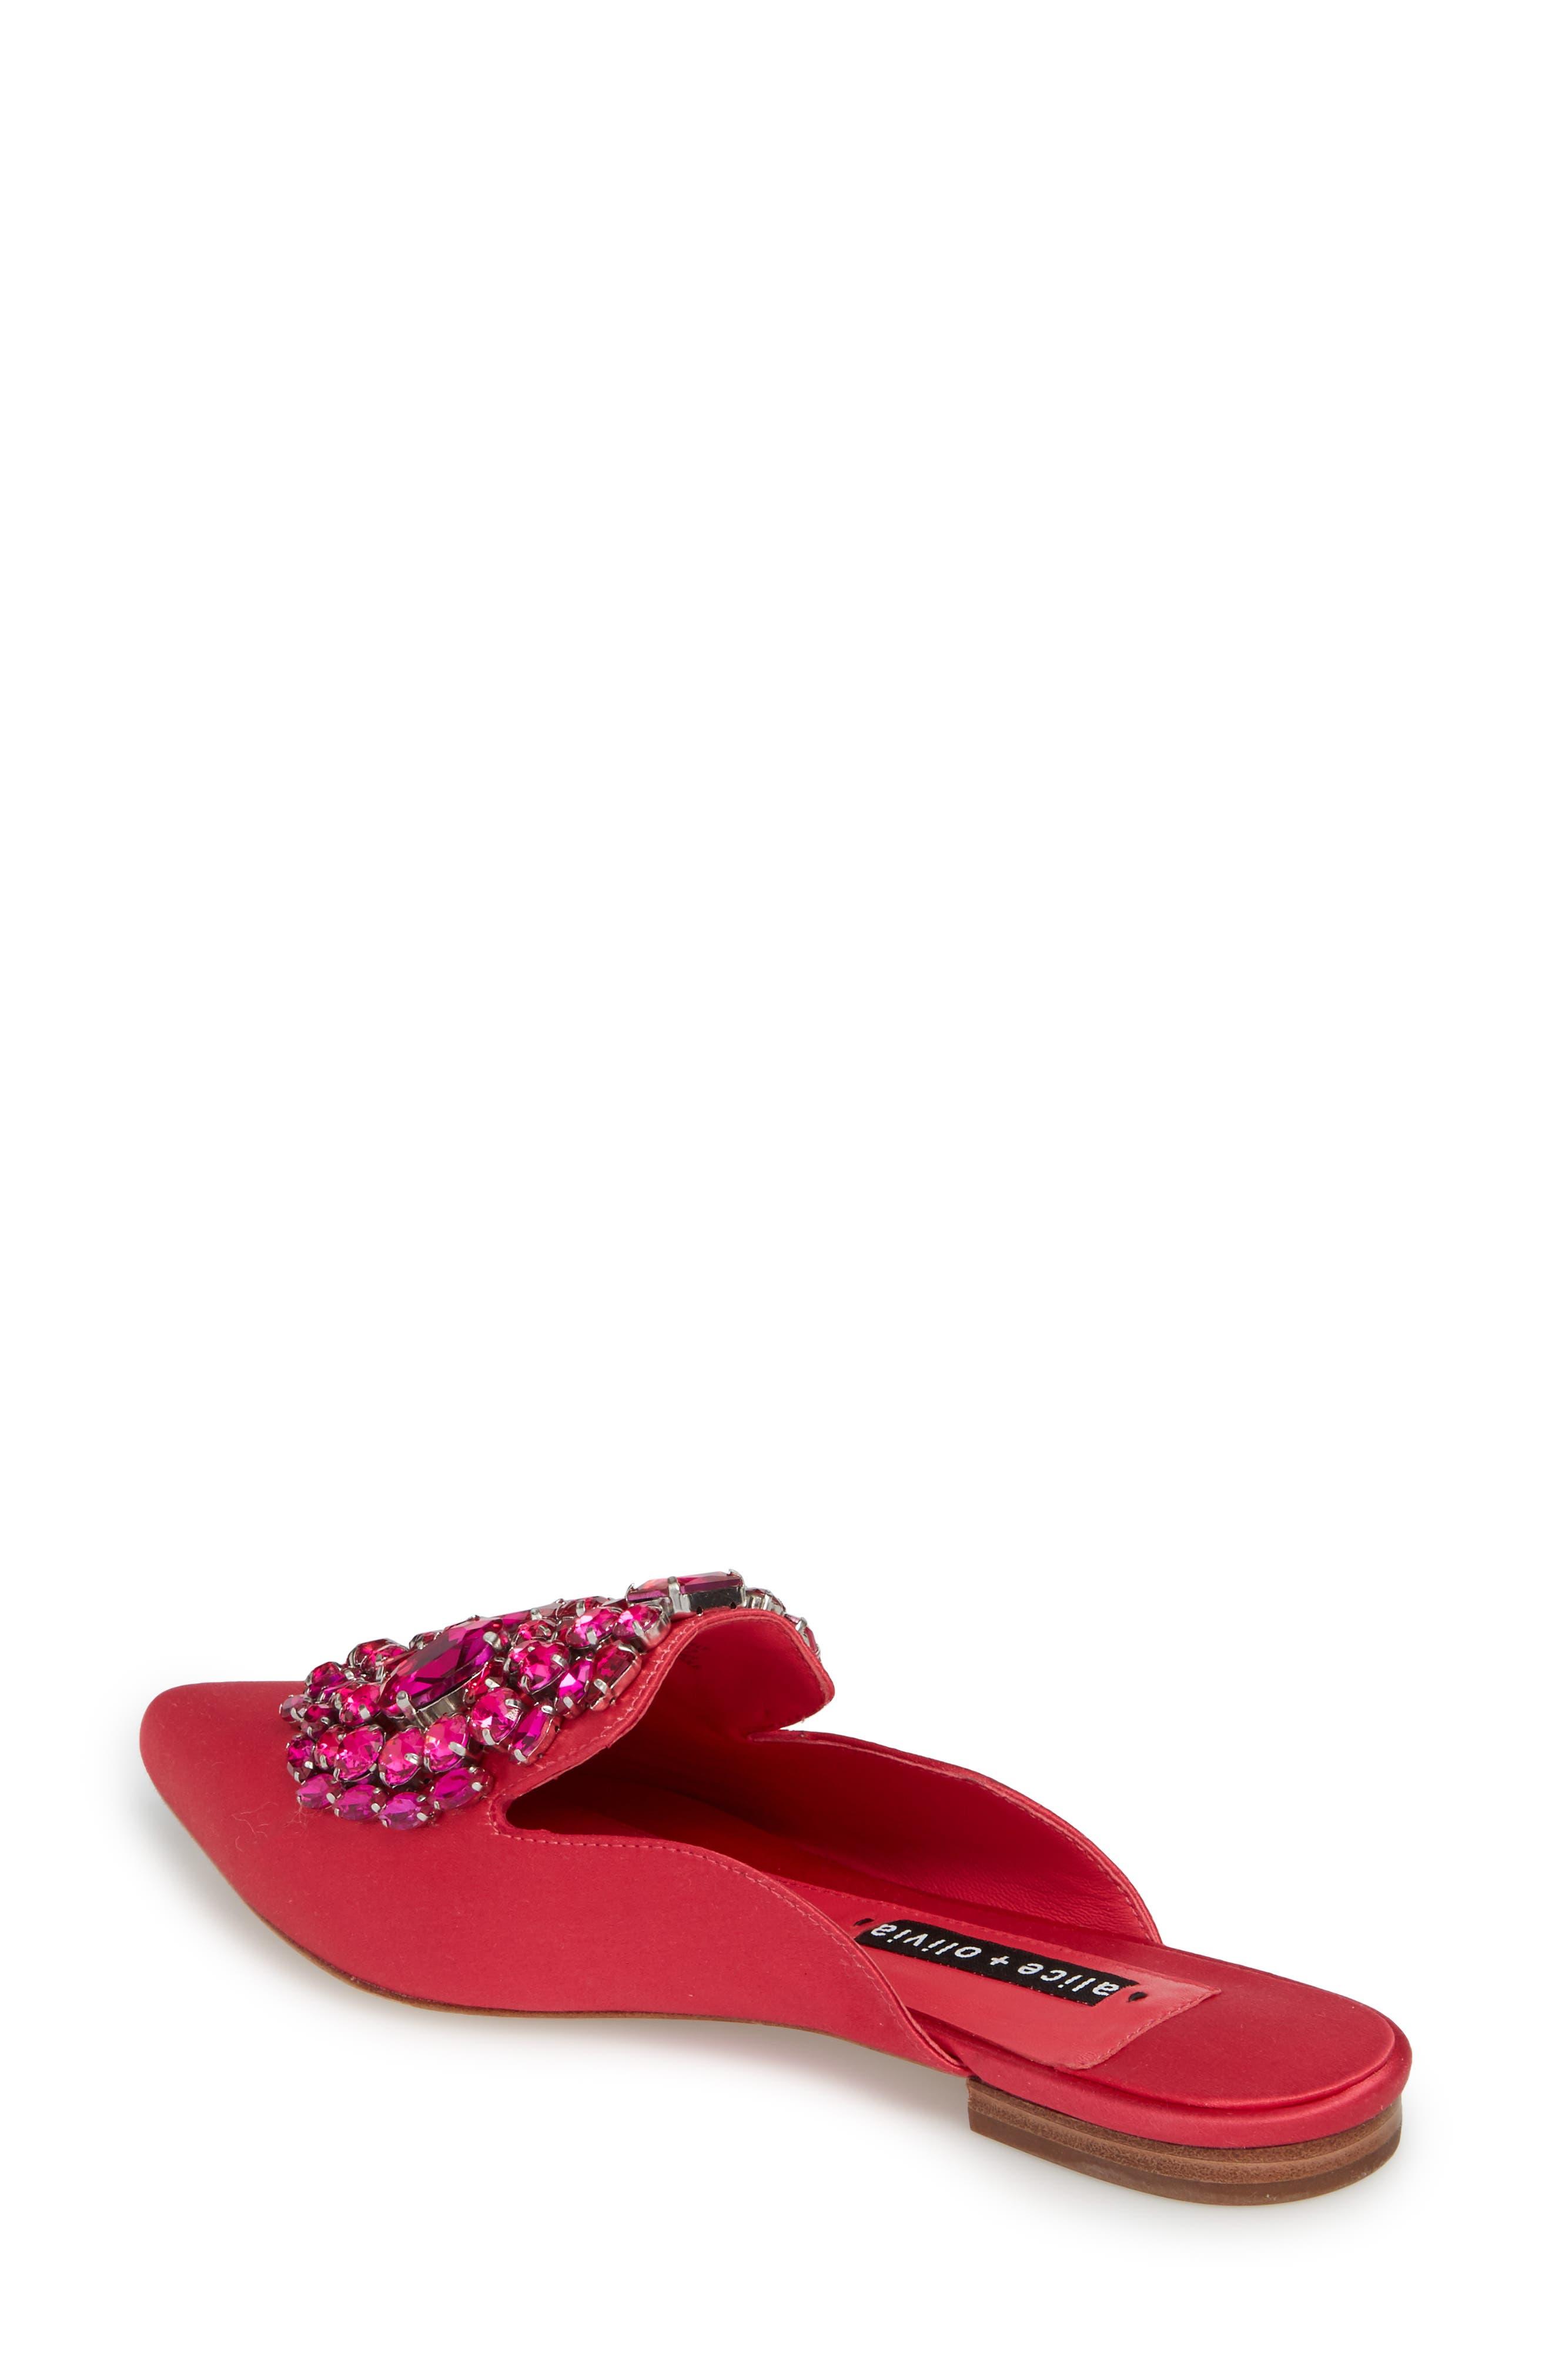 Lilly Crystal Embellished Loafer Mule,                             Alternate thumbnail 3, color,